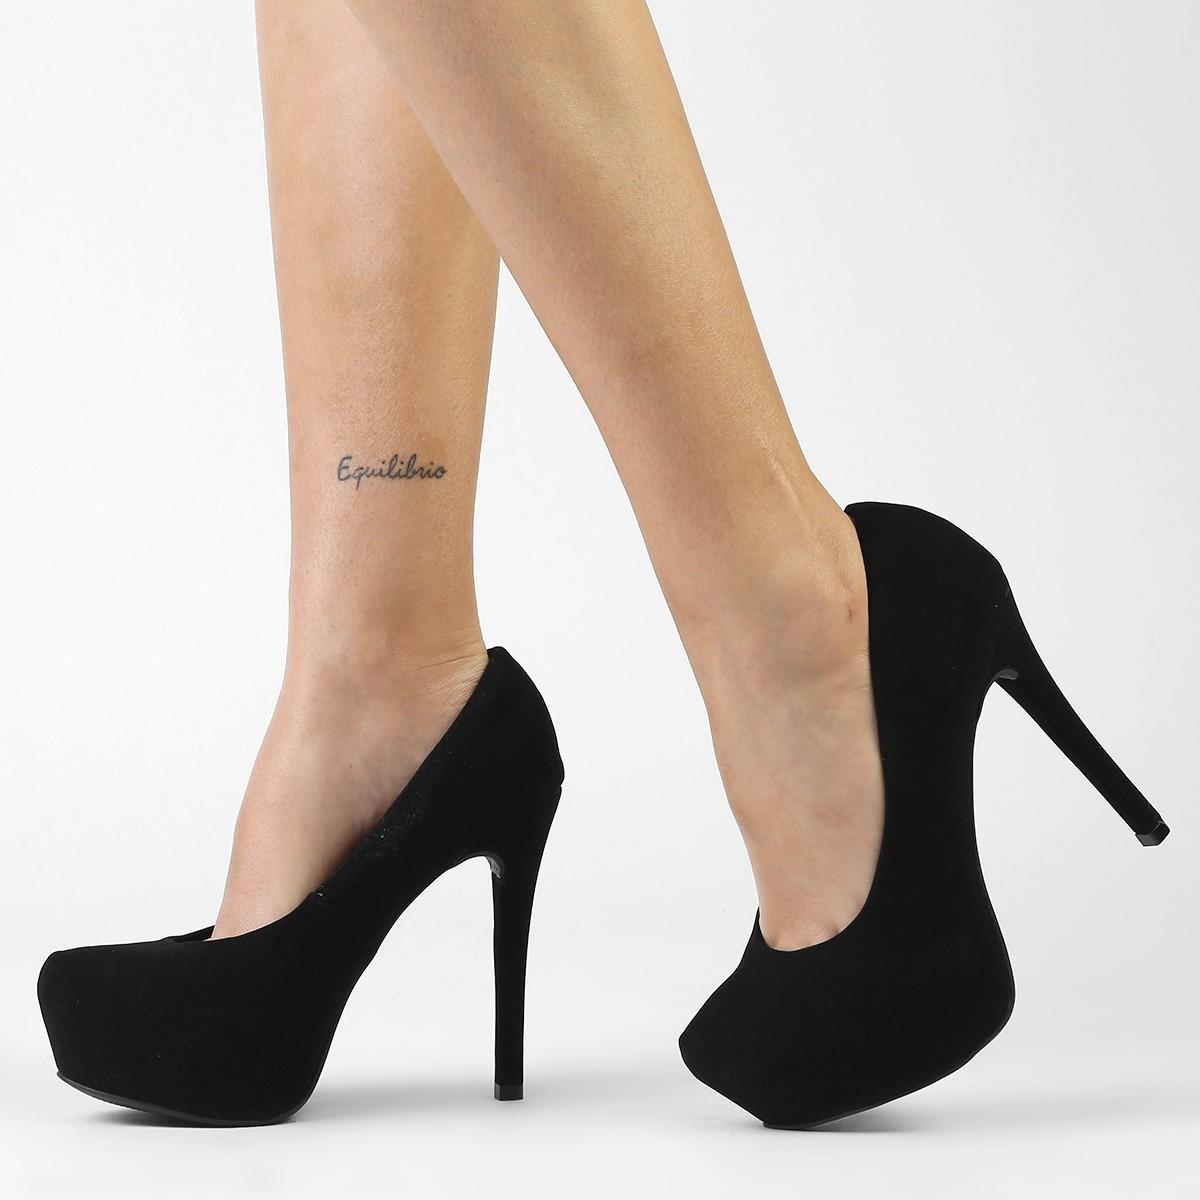 a89b262774 Sapato Salto Alto Scarpin Crysalis -pronta Intrega - R$ 135,00 em ...